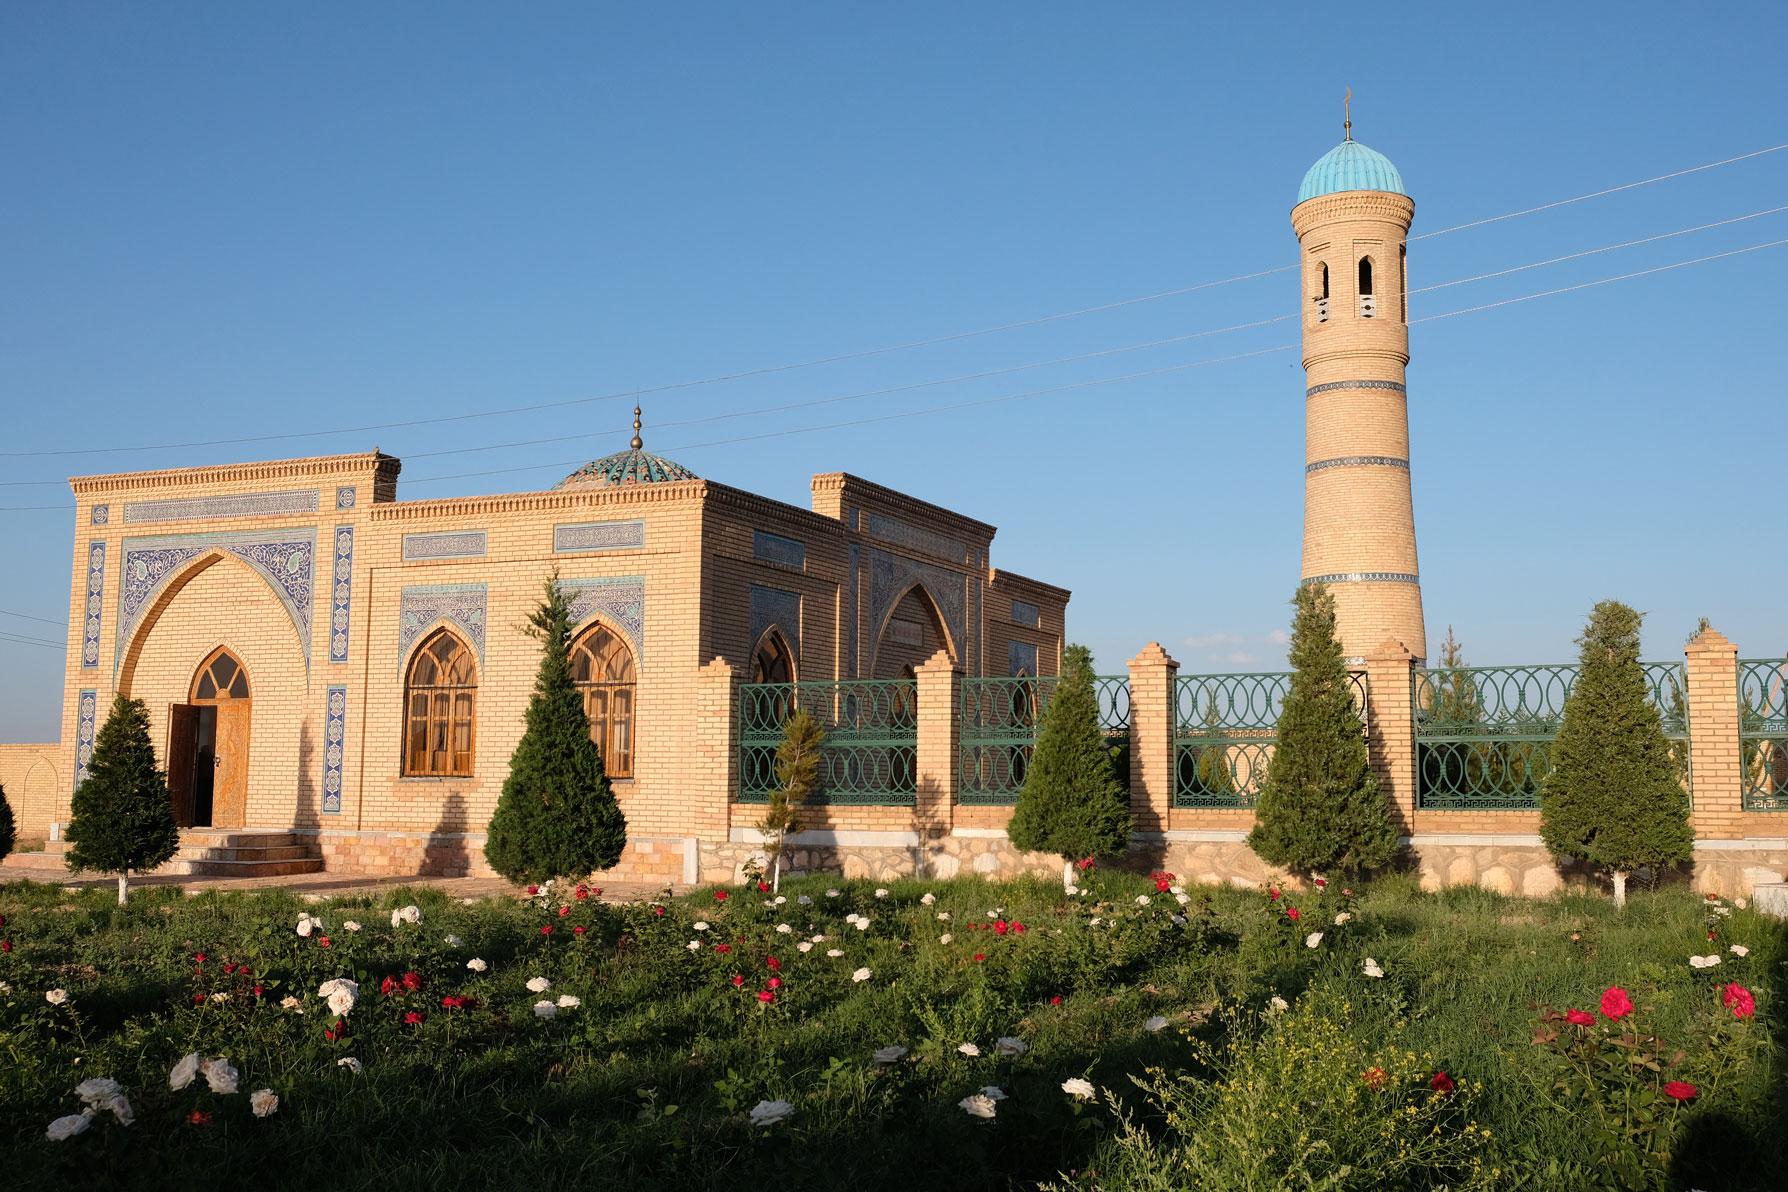 Die Moschee Nurotas